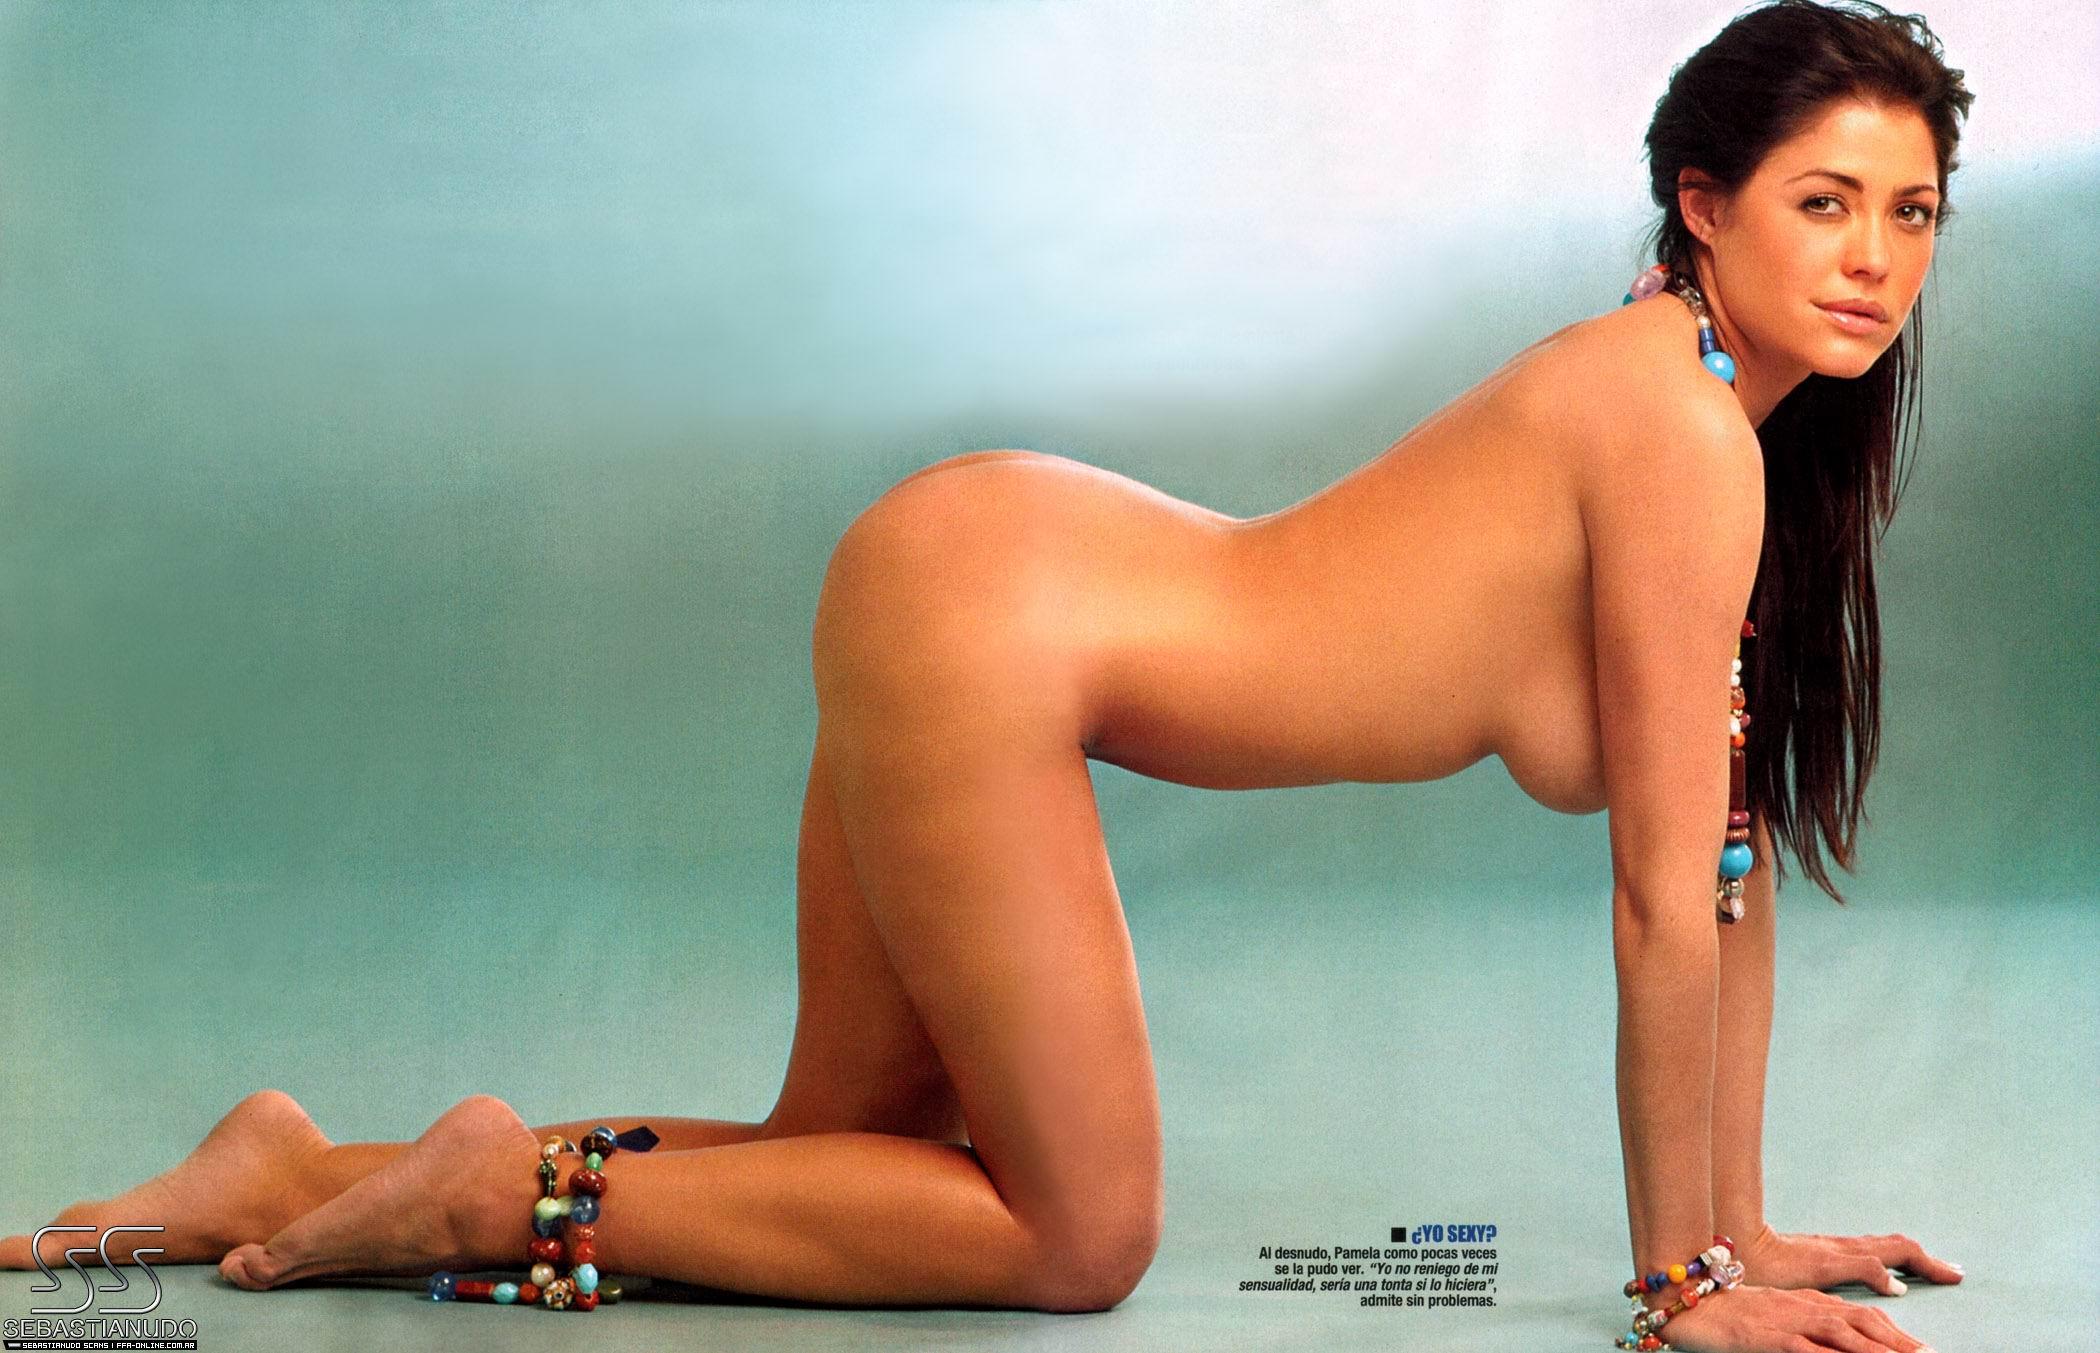 Pamela david nude pics pics, sex tape ancensored